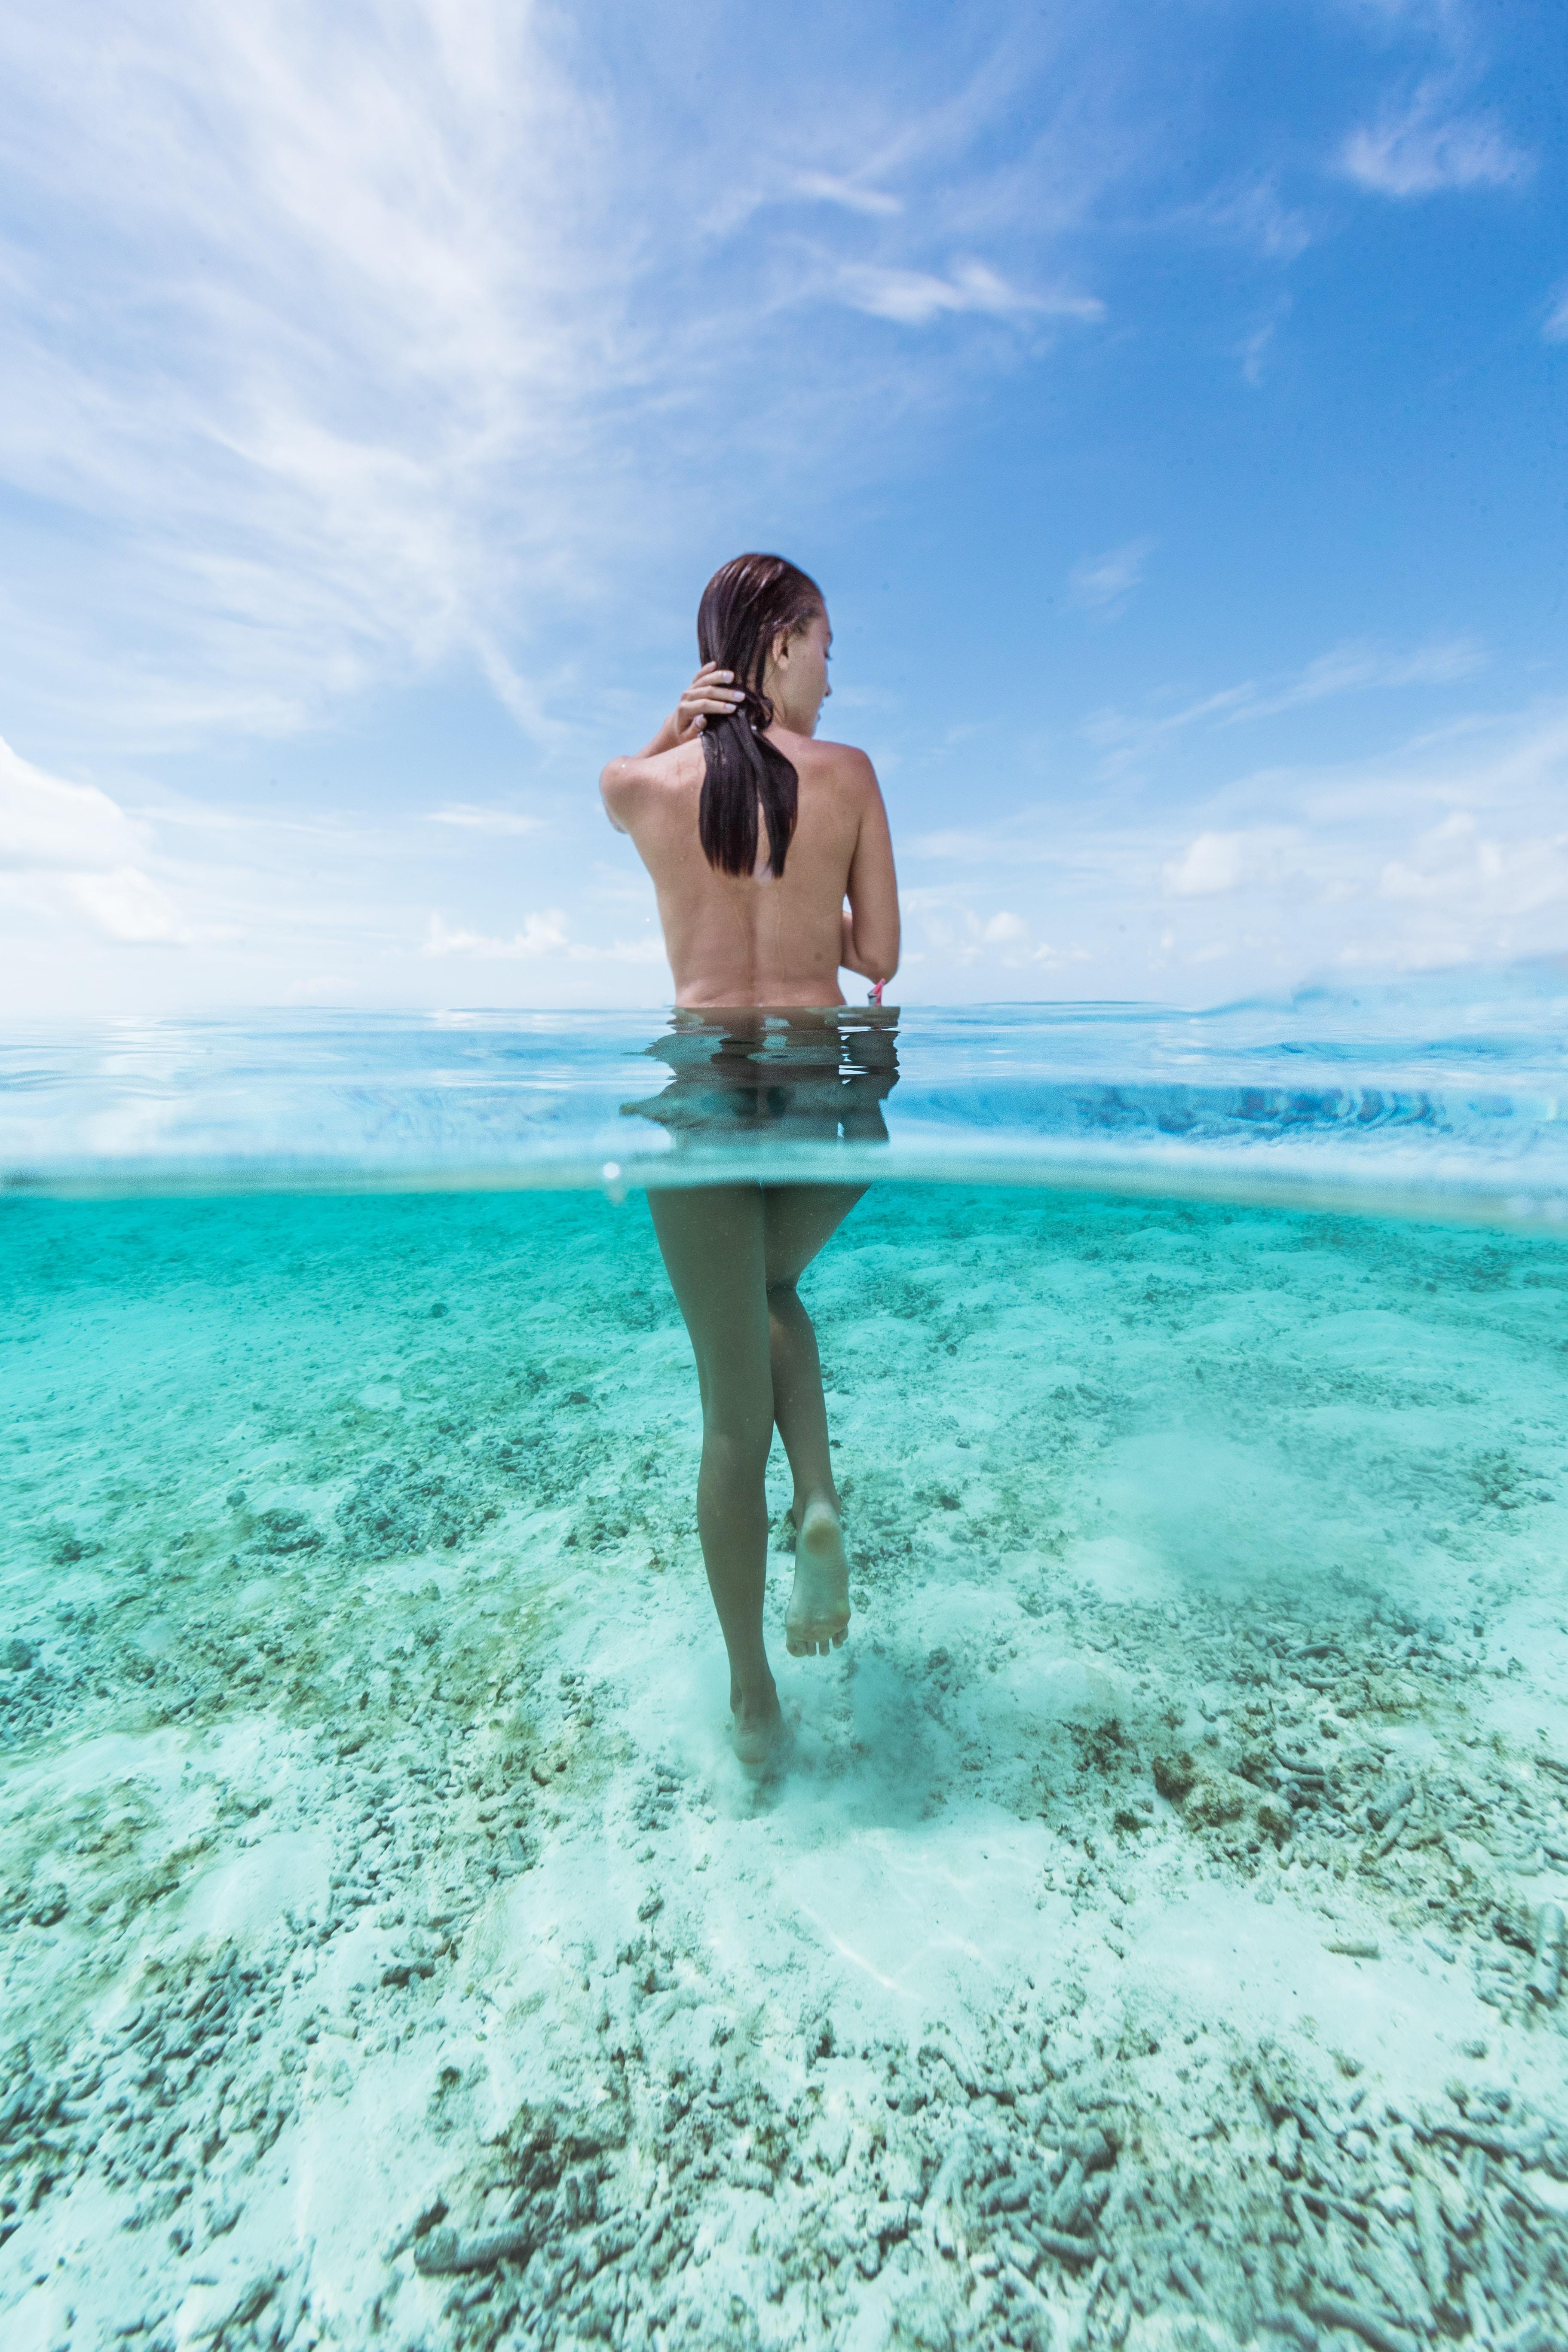 Oceane dream gallery nude